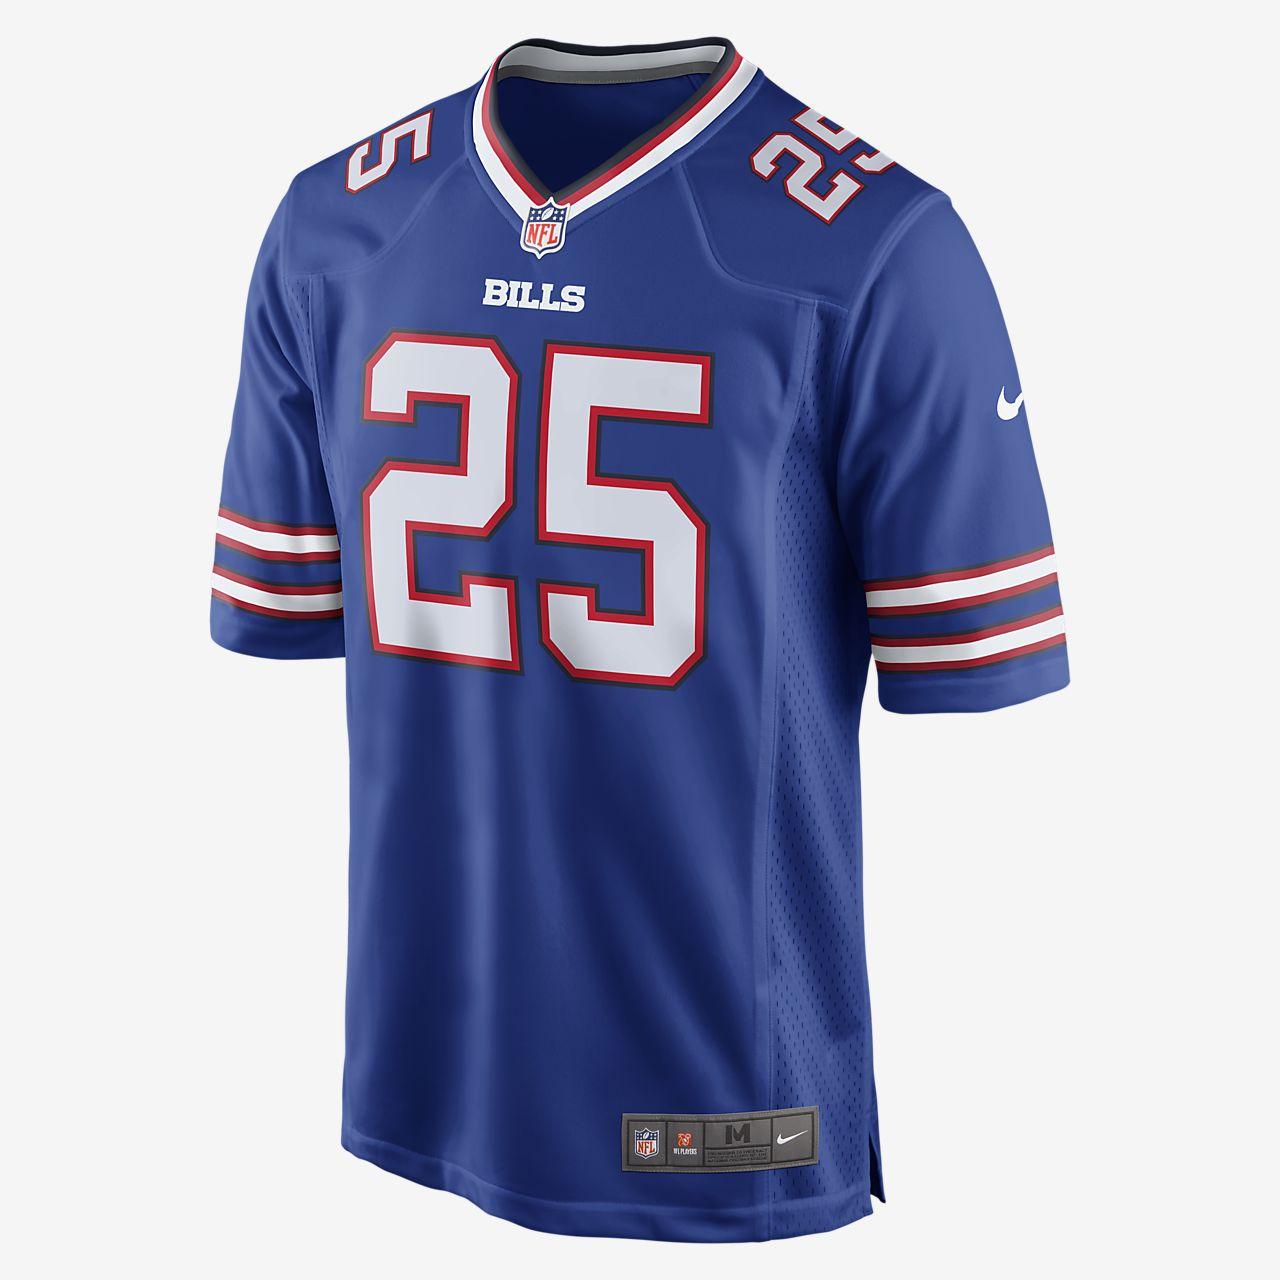 Maillot de football américain NFL Buffalo Bills (LeSean McCoy) pour Homme